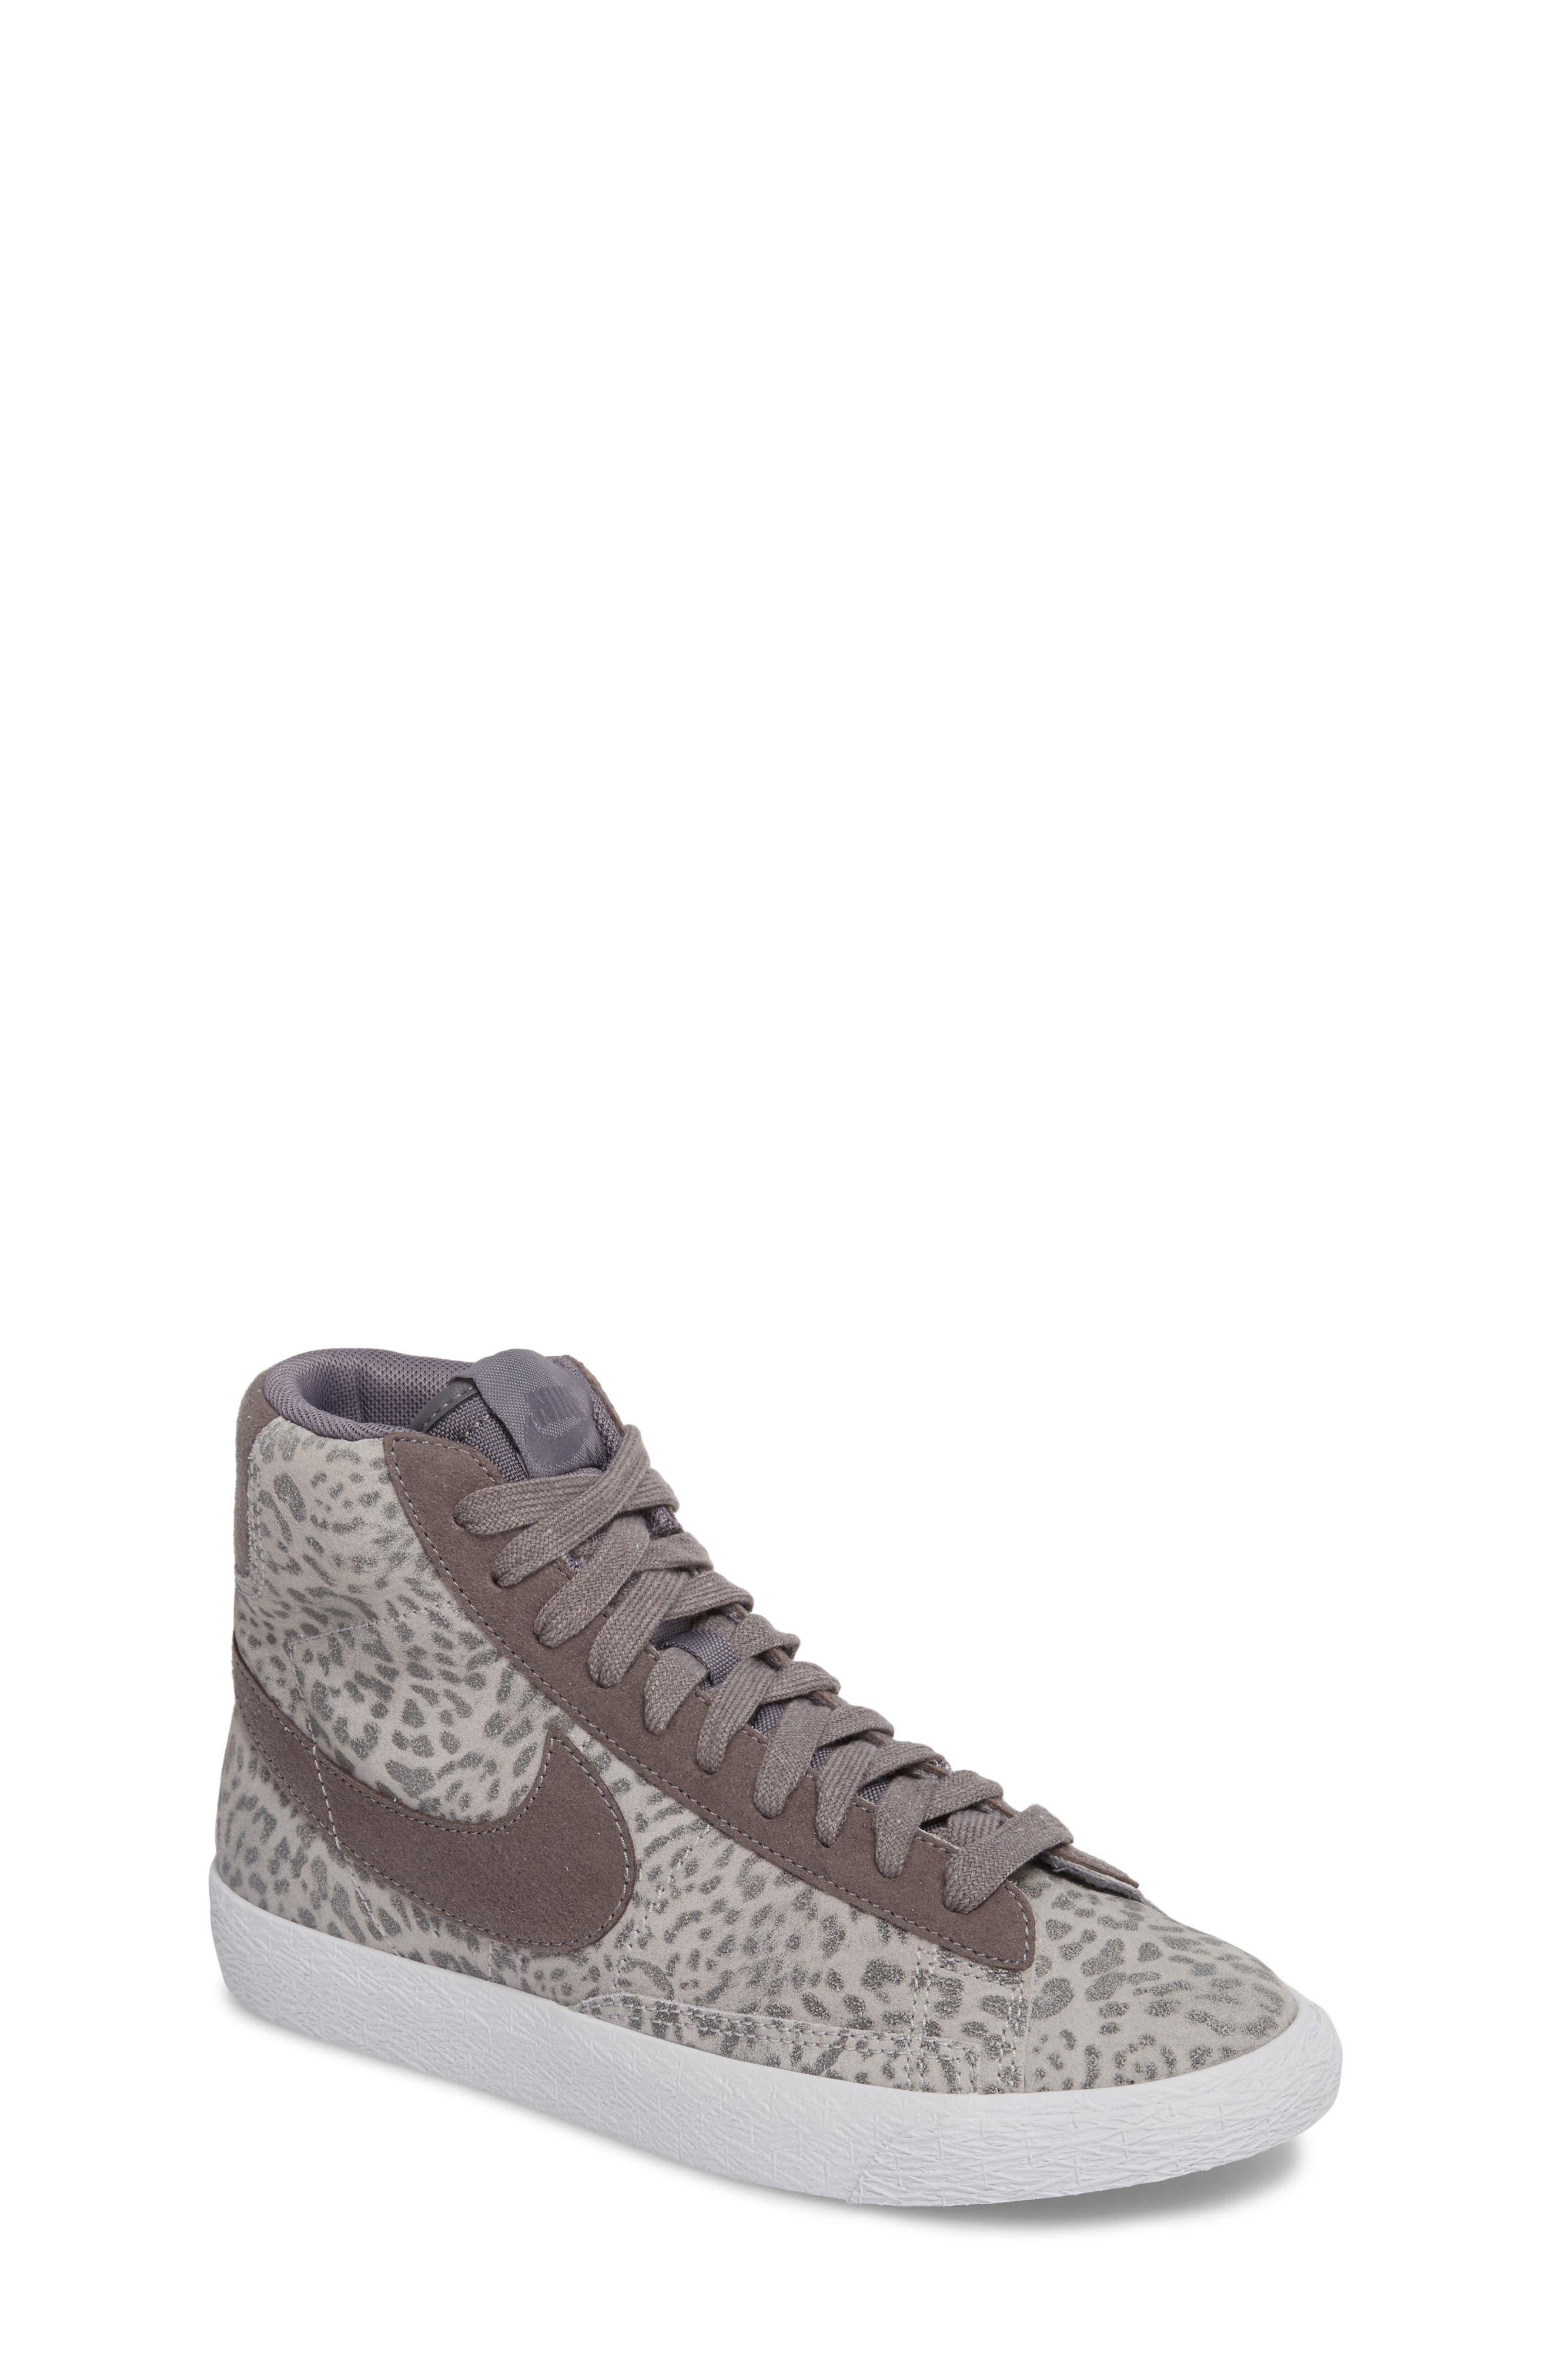 Nike Blazer Mid SE High Top Sneaker (Big Kid)